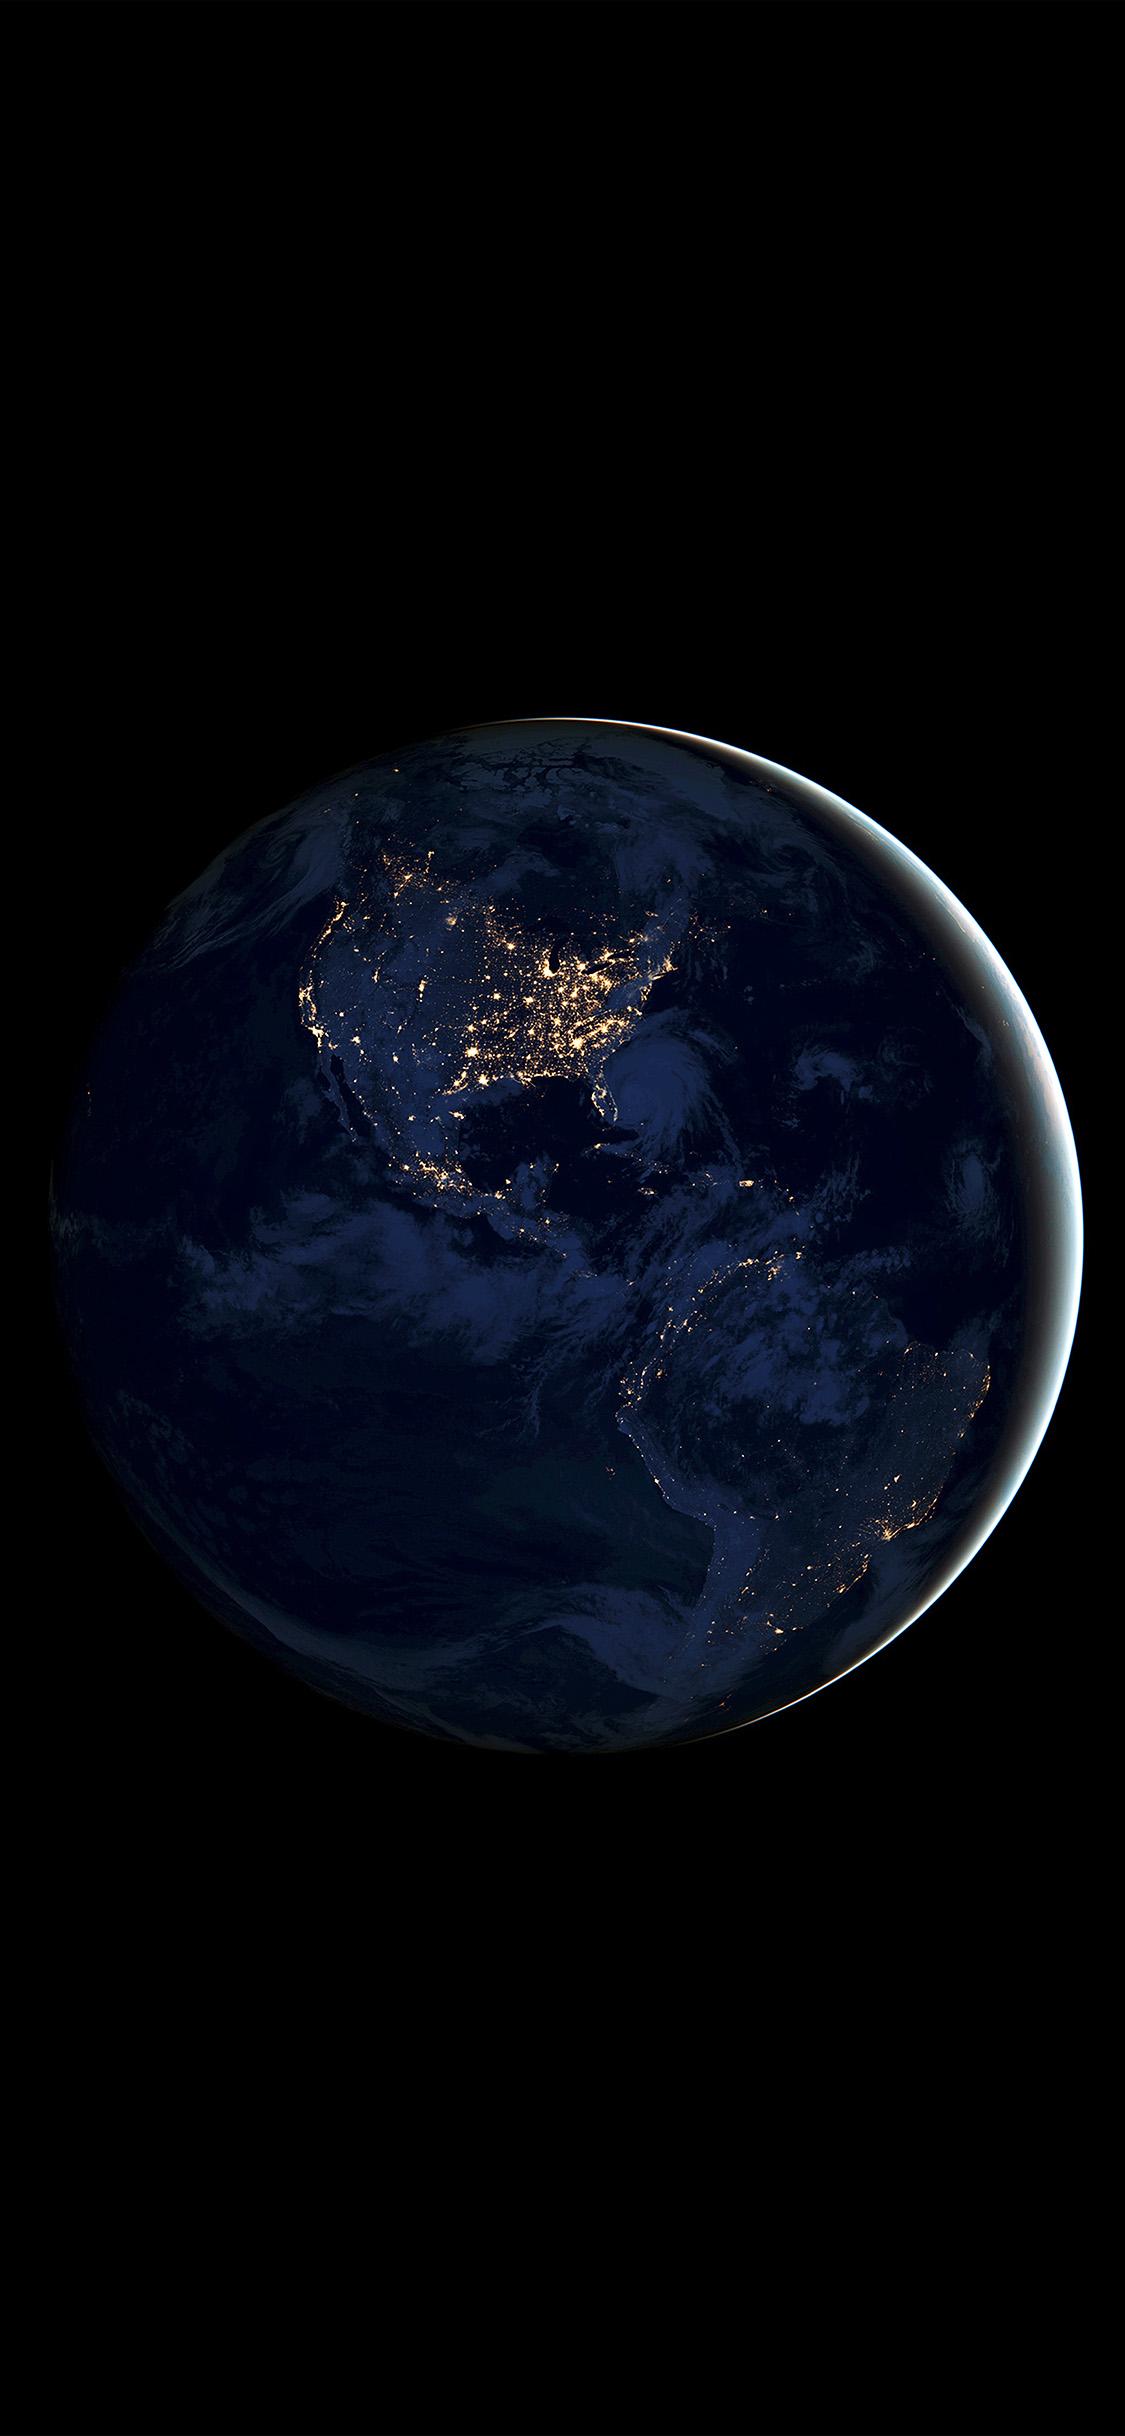 iPhonexpapers.com-Apple-iPhone-wallpaper-bd21-earth-space-dark-night-art-illustration